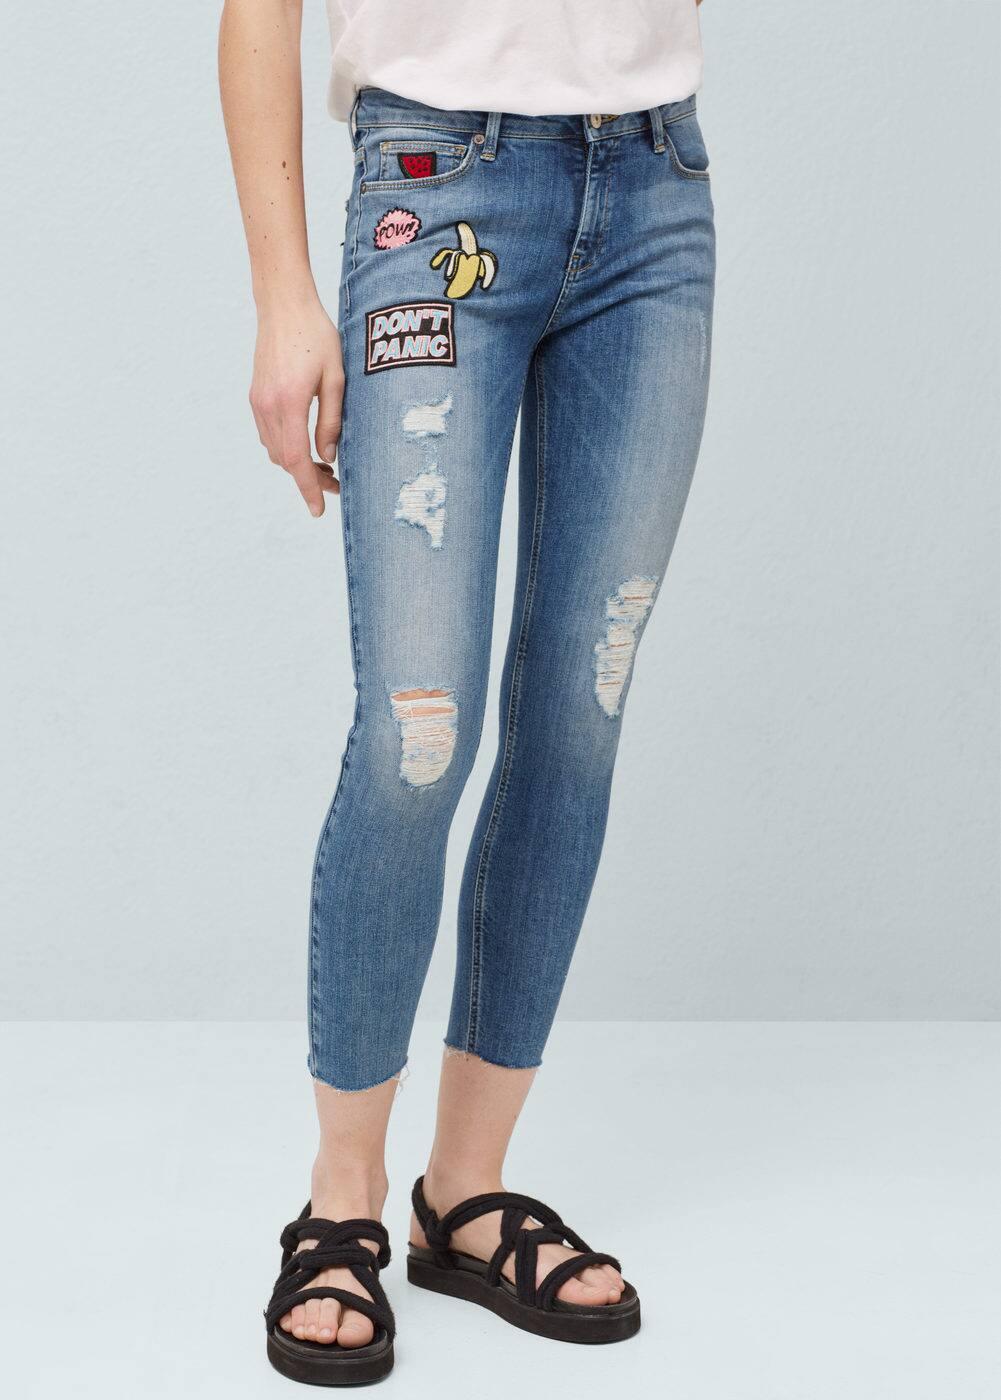 Mango jeans skinny regular waist